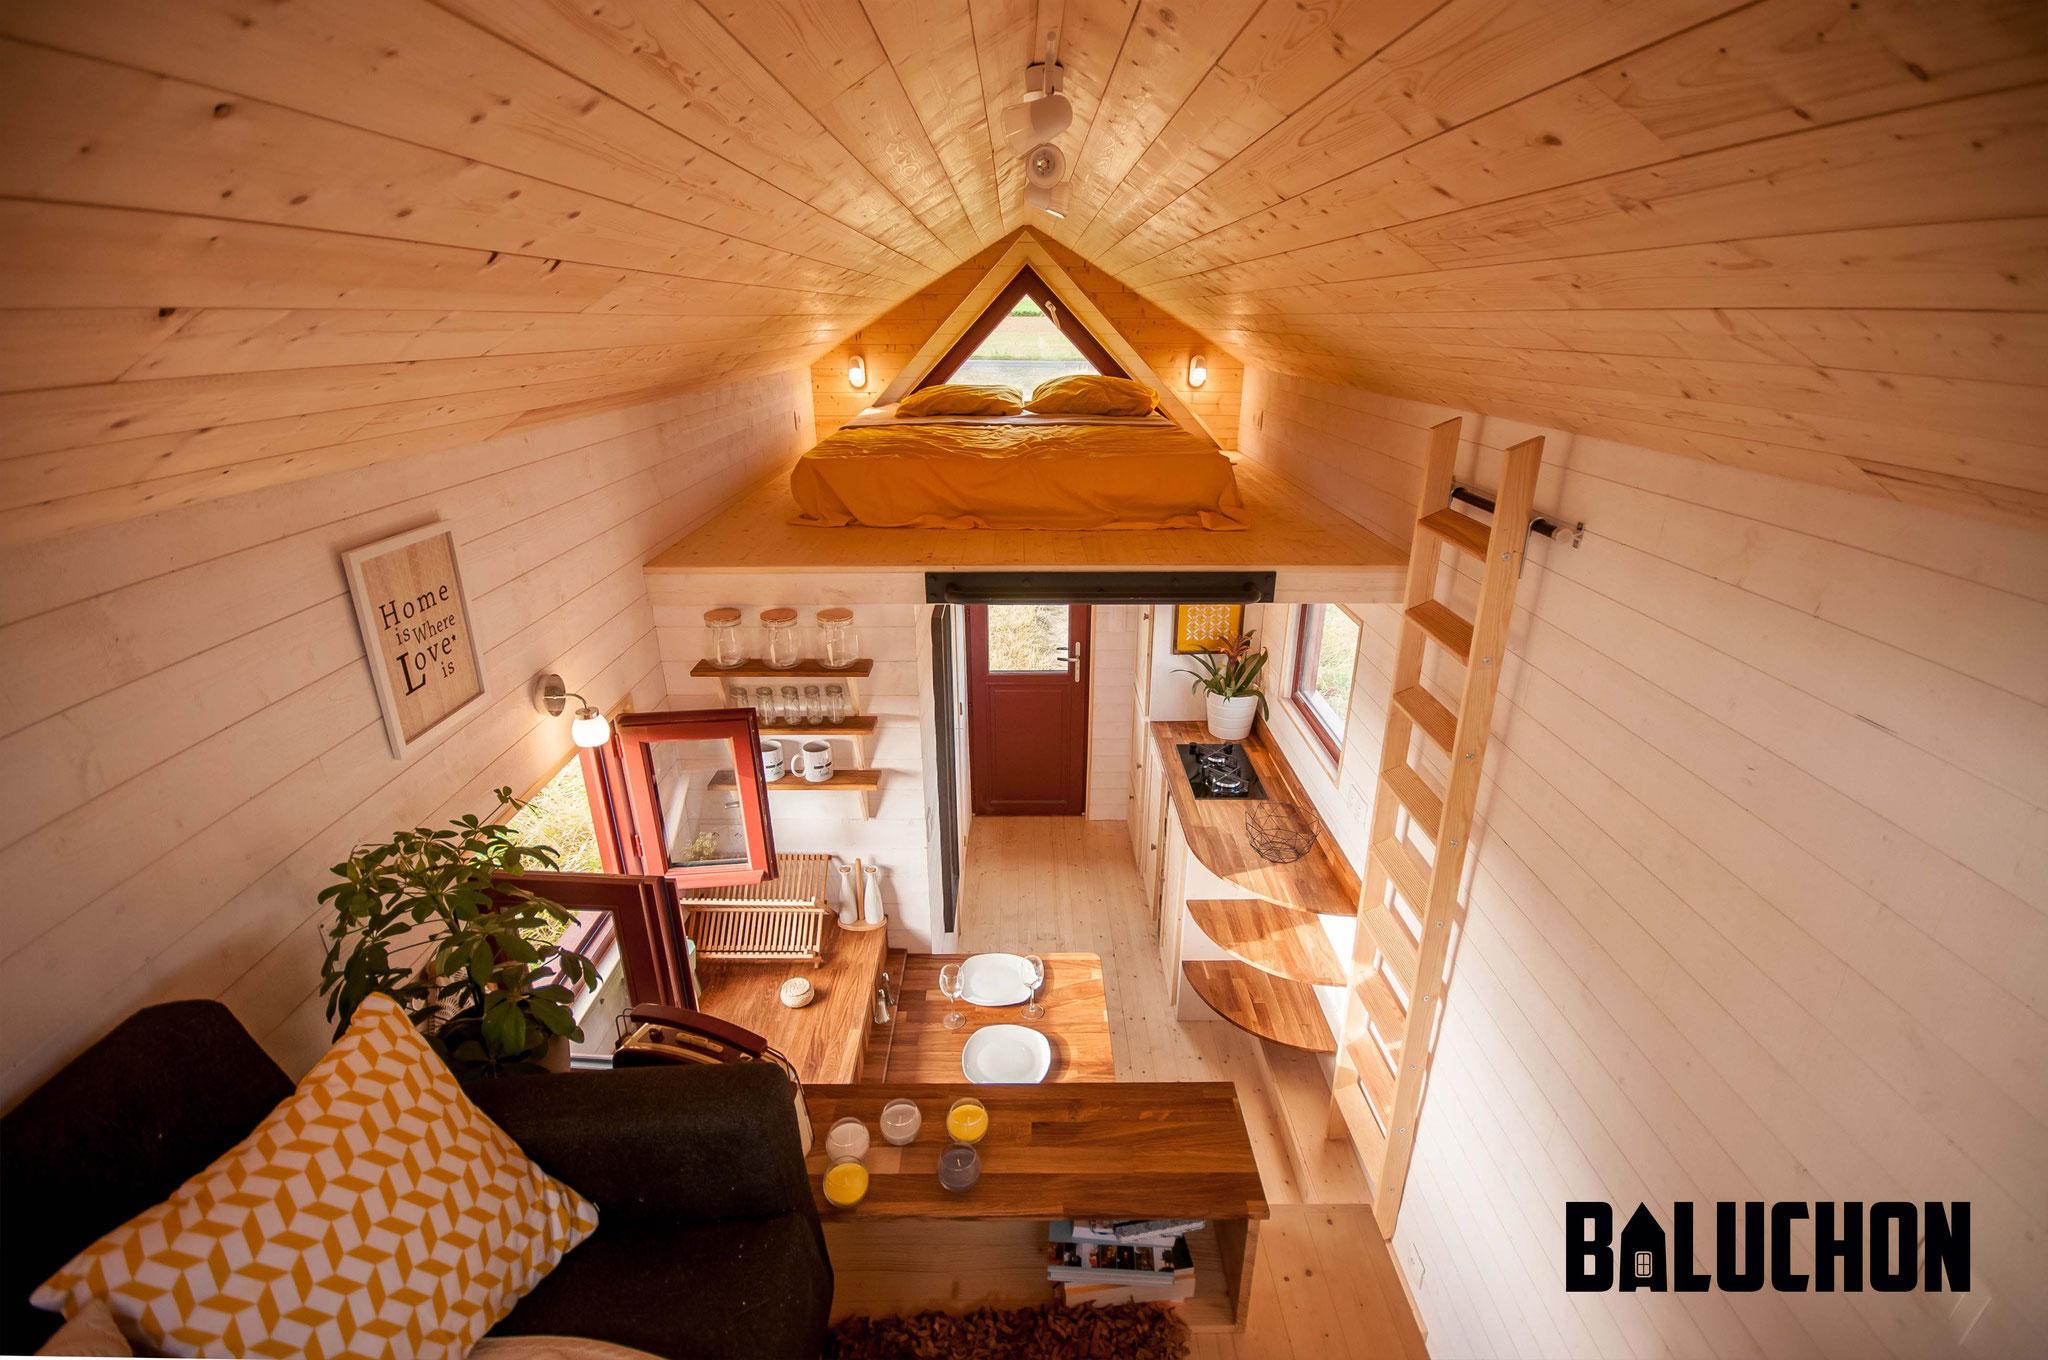 L'Odyssée - French Tiny House Interior 2 lofts